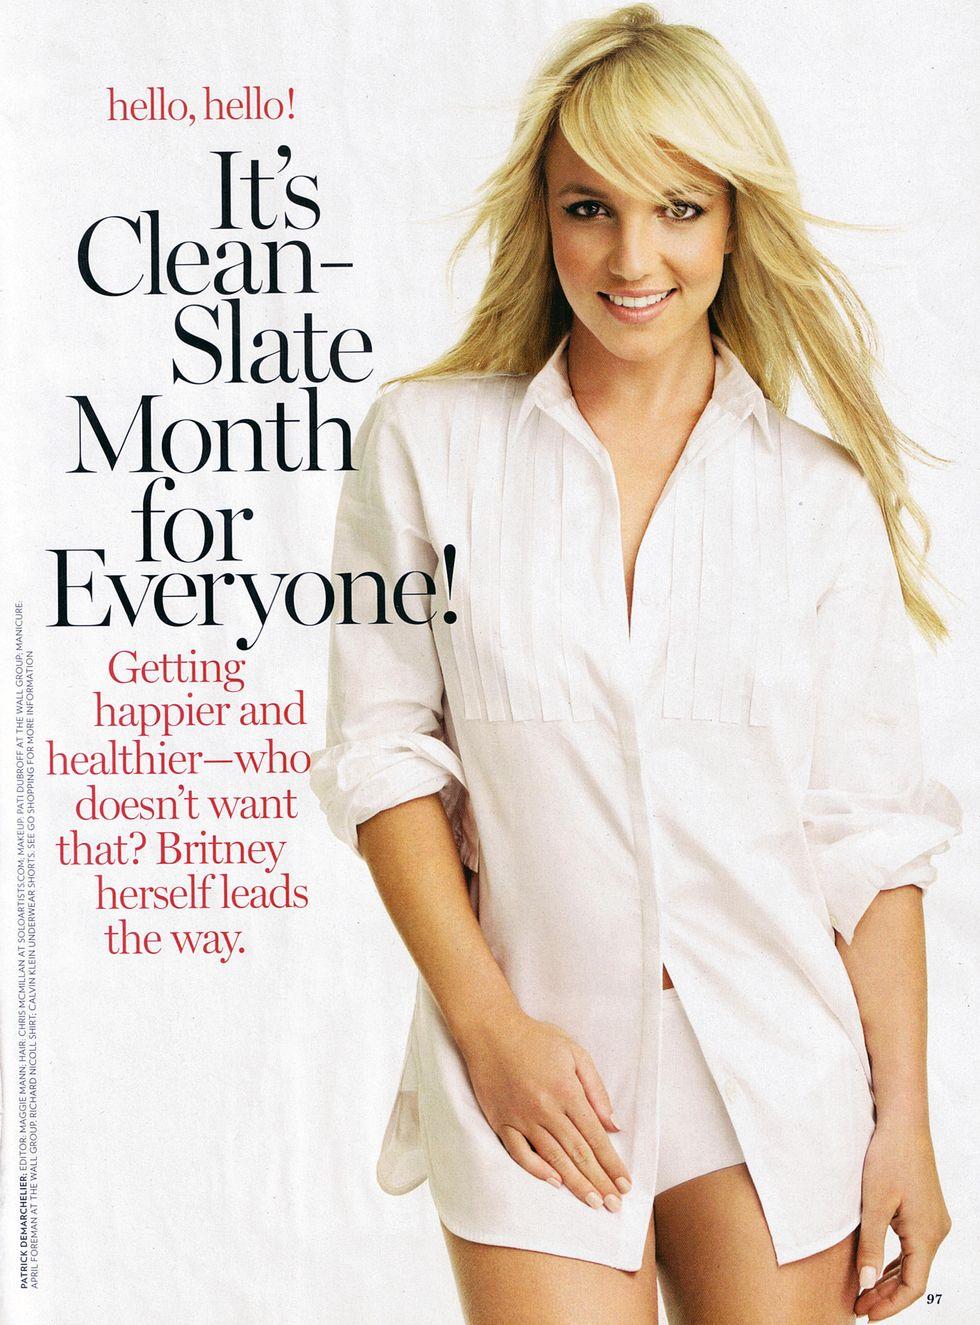 britney-spears-glamour-magazine-january-2009-01